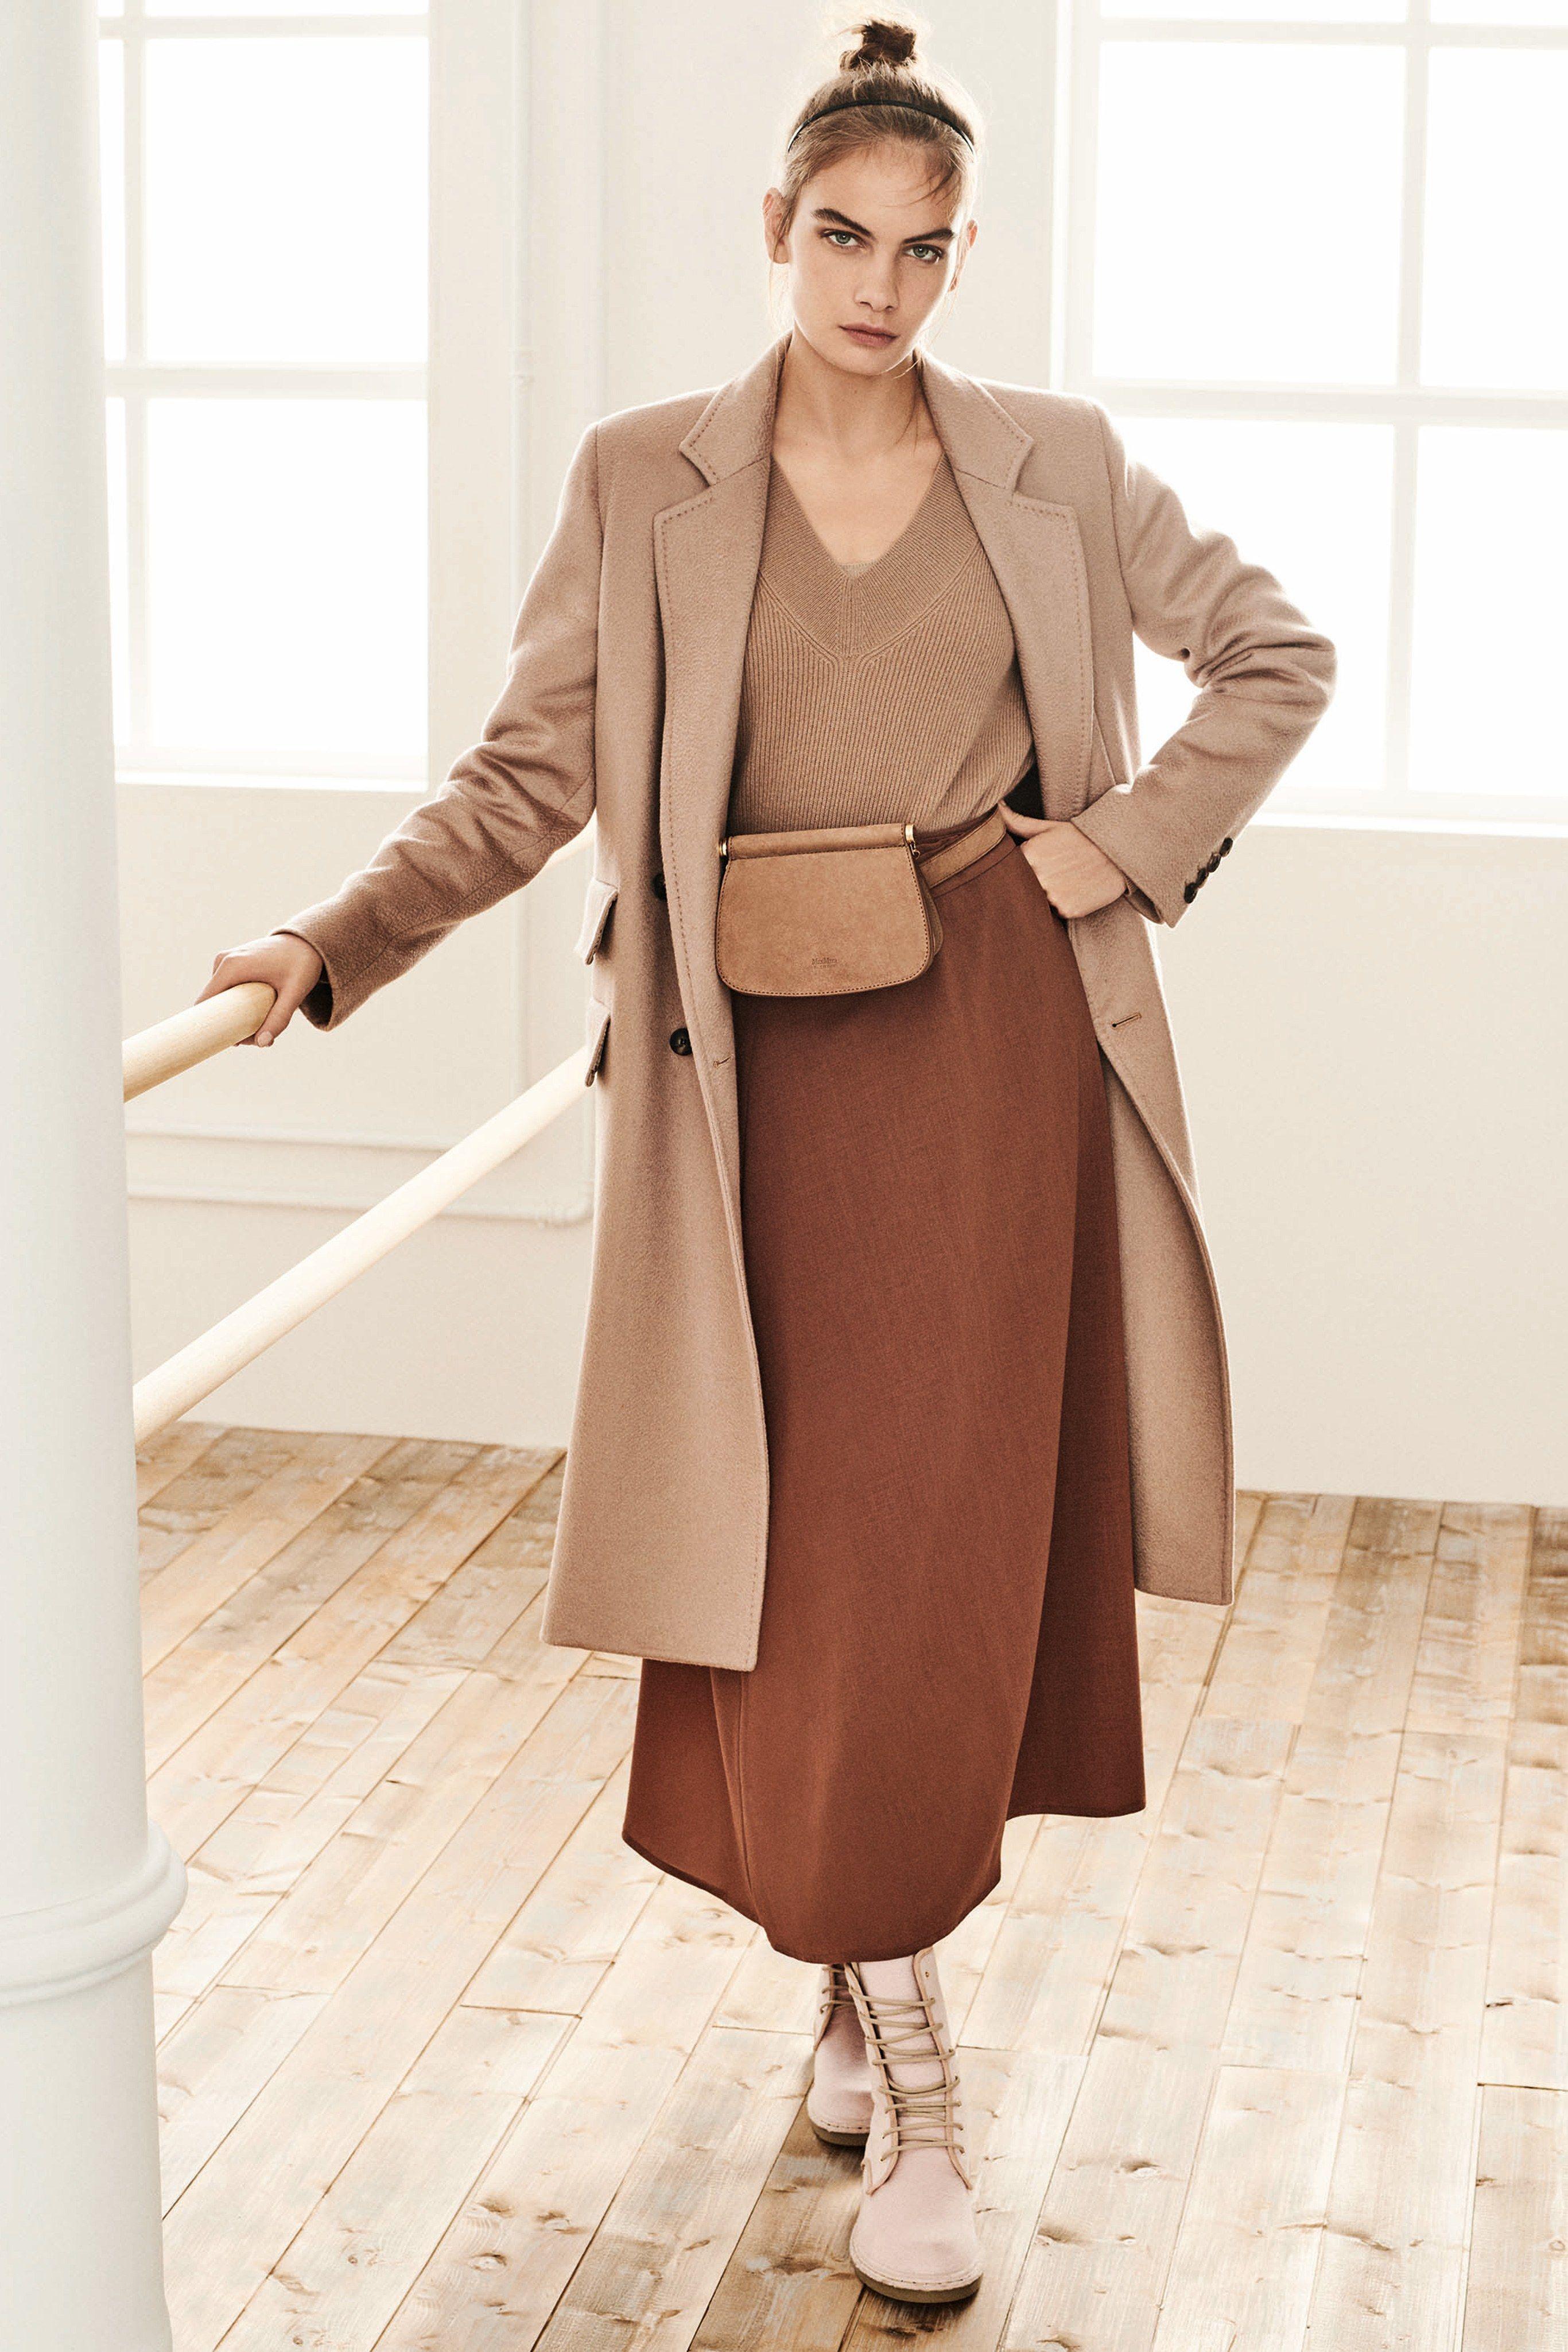 Max Mara Pre Fall 2019 Collection Vogue Fall Fashion Coats Fashion Autumn Fashion